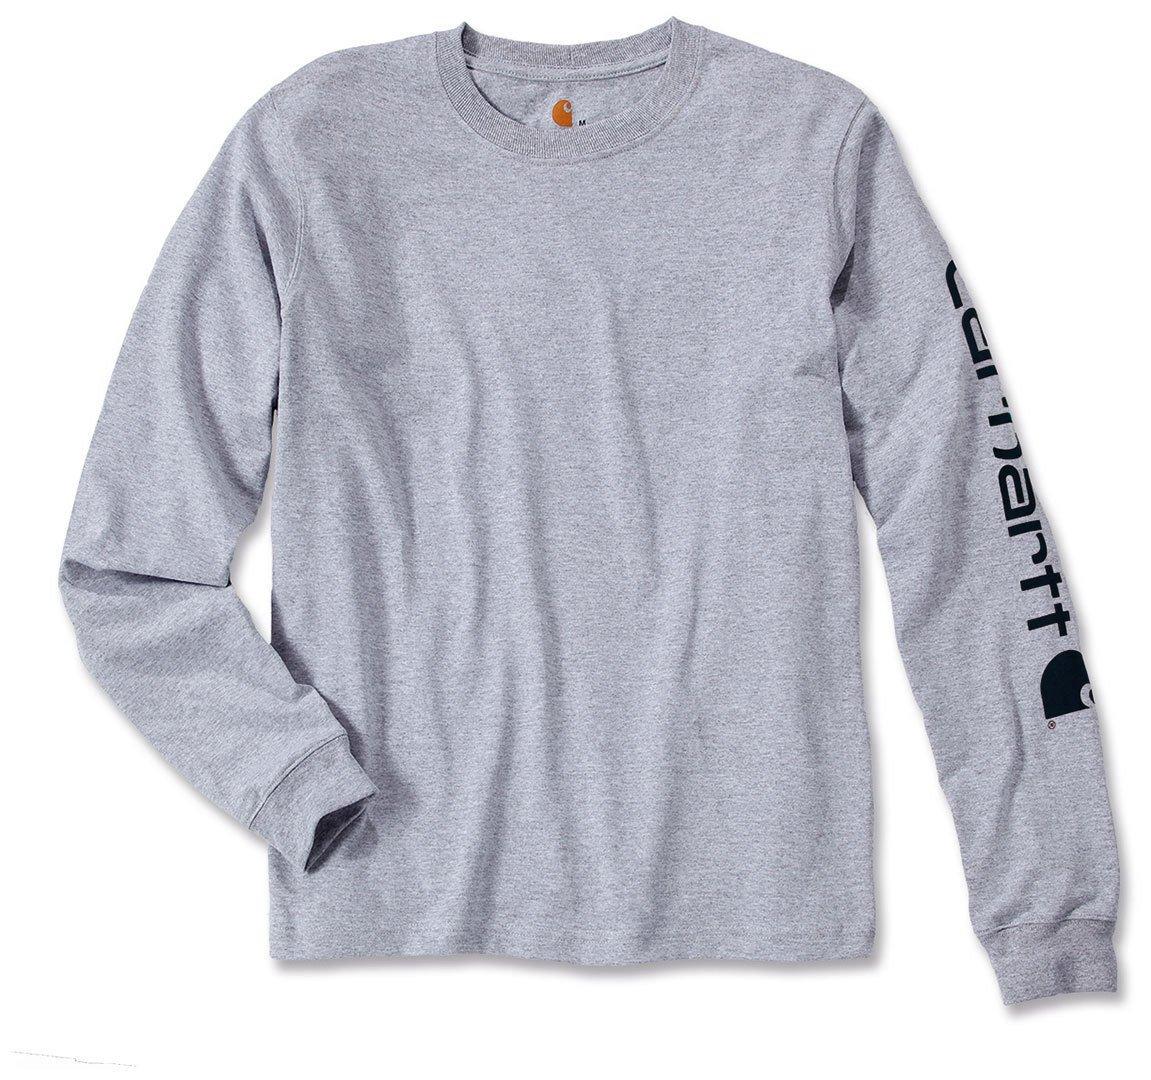 XX-Large Heather Grey Carhartt .EK231.HGY.S008 Sleeve Logo T-Shirt